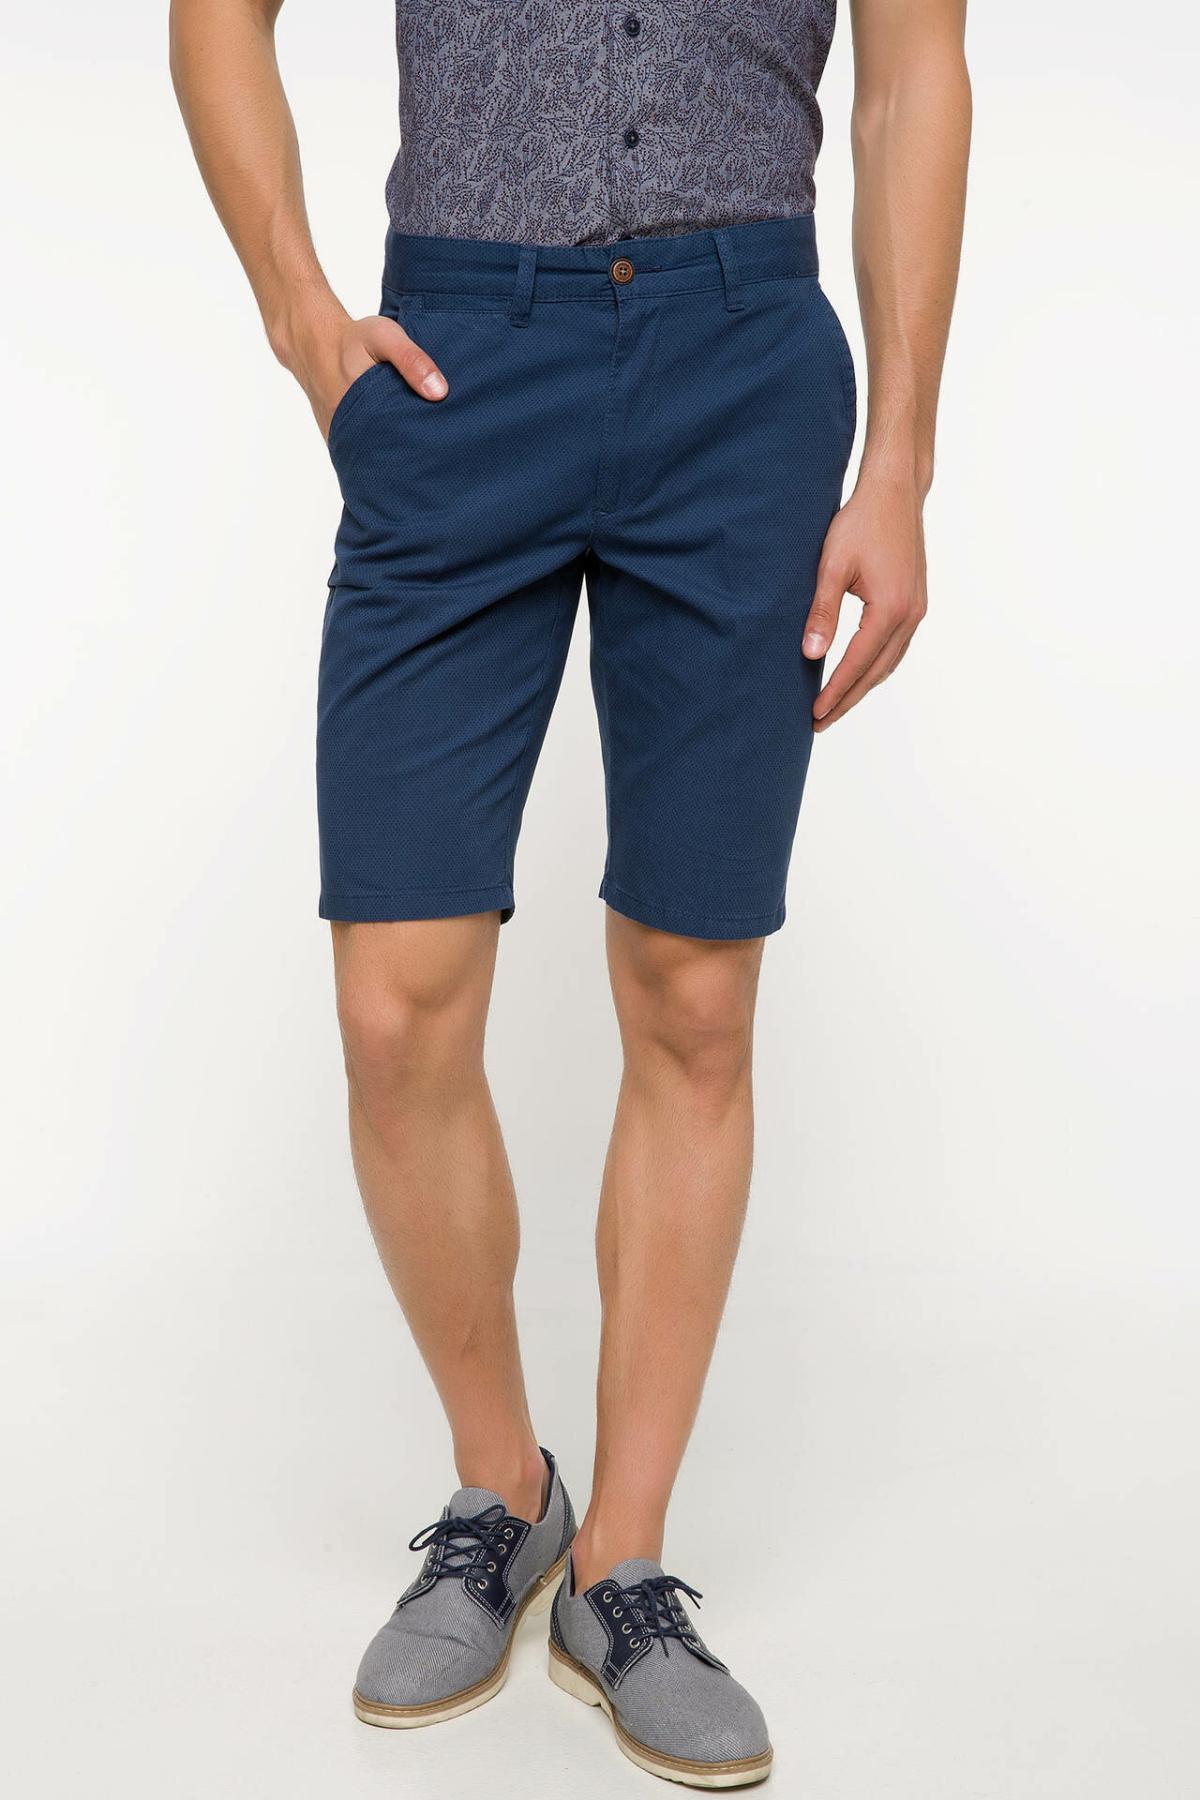 DeFacto Man Summer Solid Color Shorts Men Casual Beige Short Pants Male Straight Bermuda Shorts-I7636AZ18SM